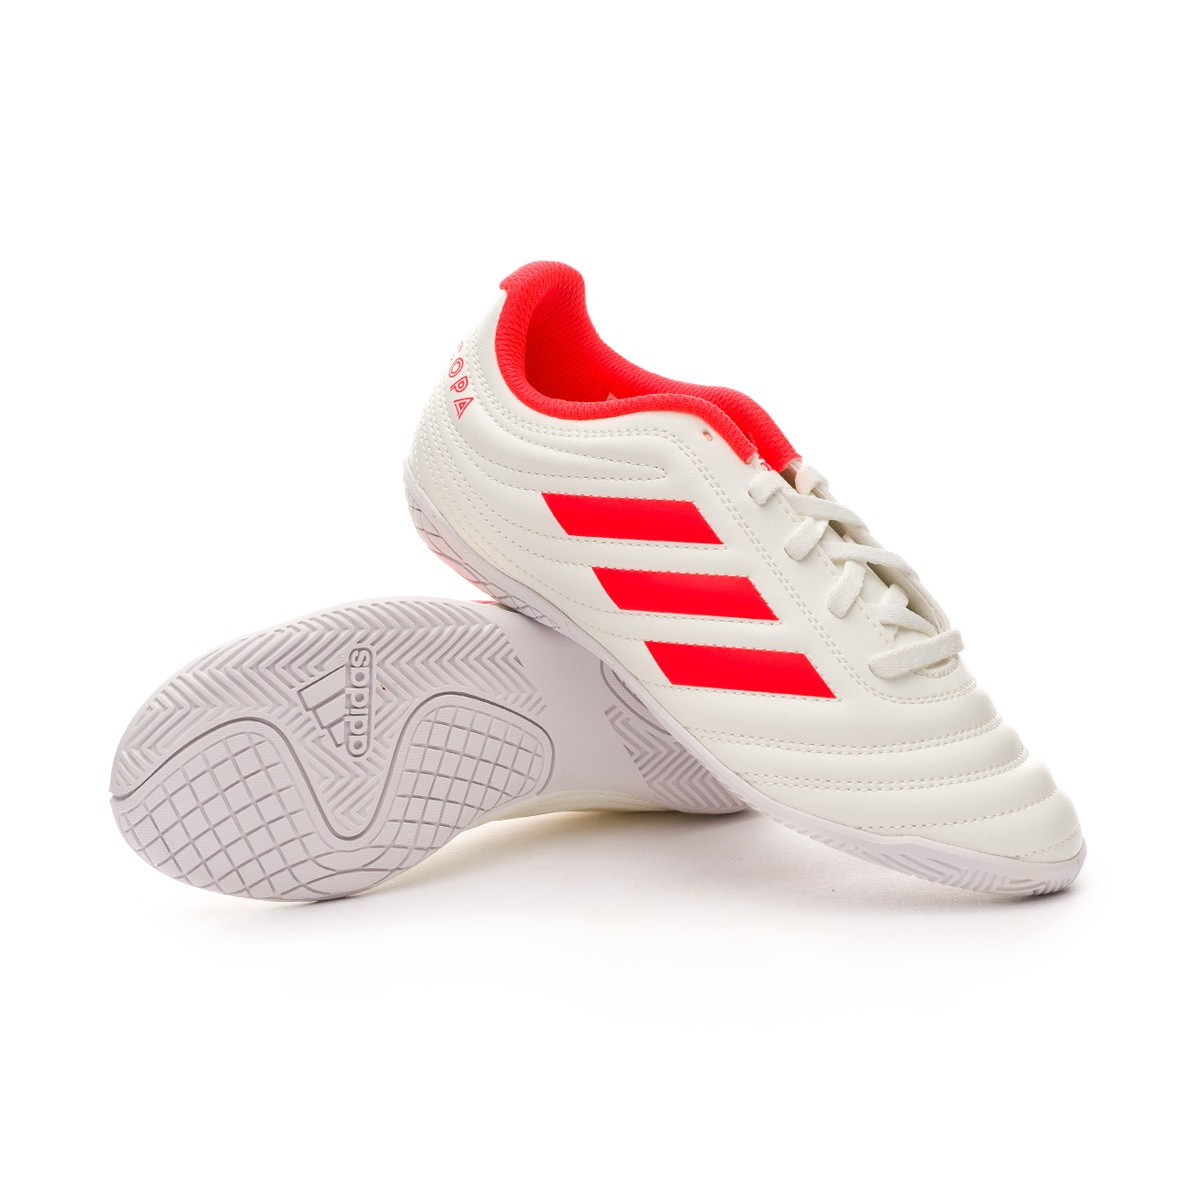 mizuno futsal shoes price today